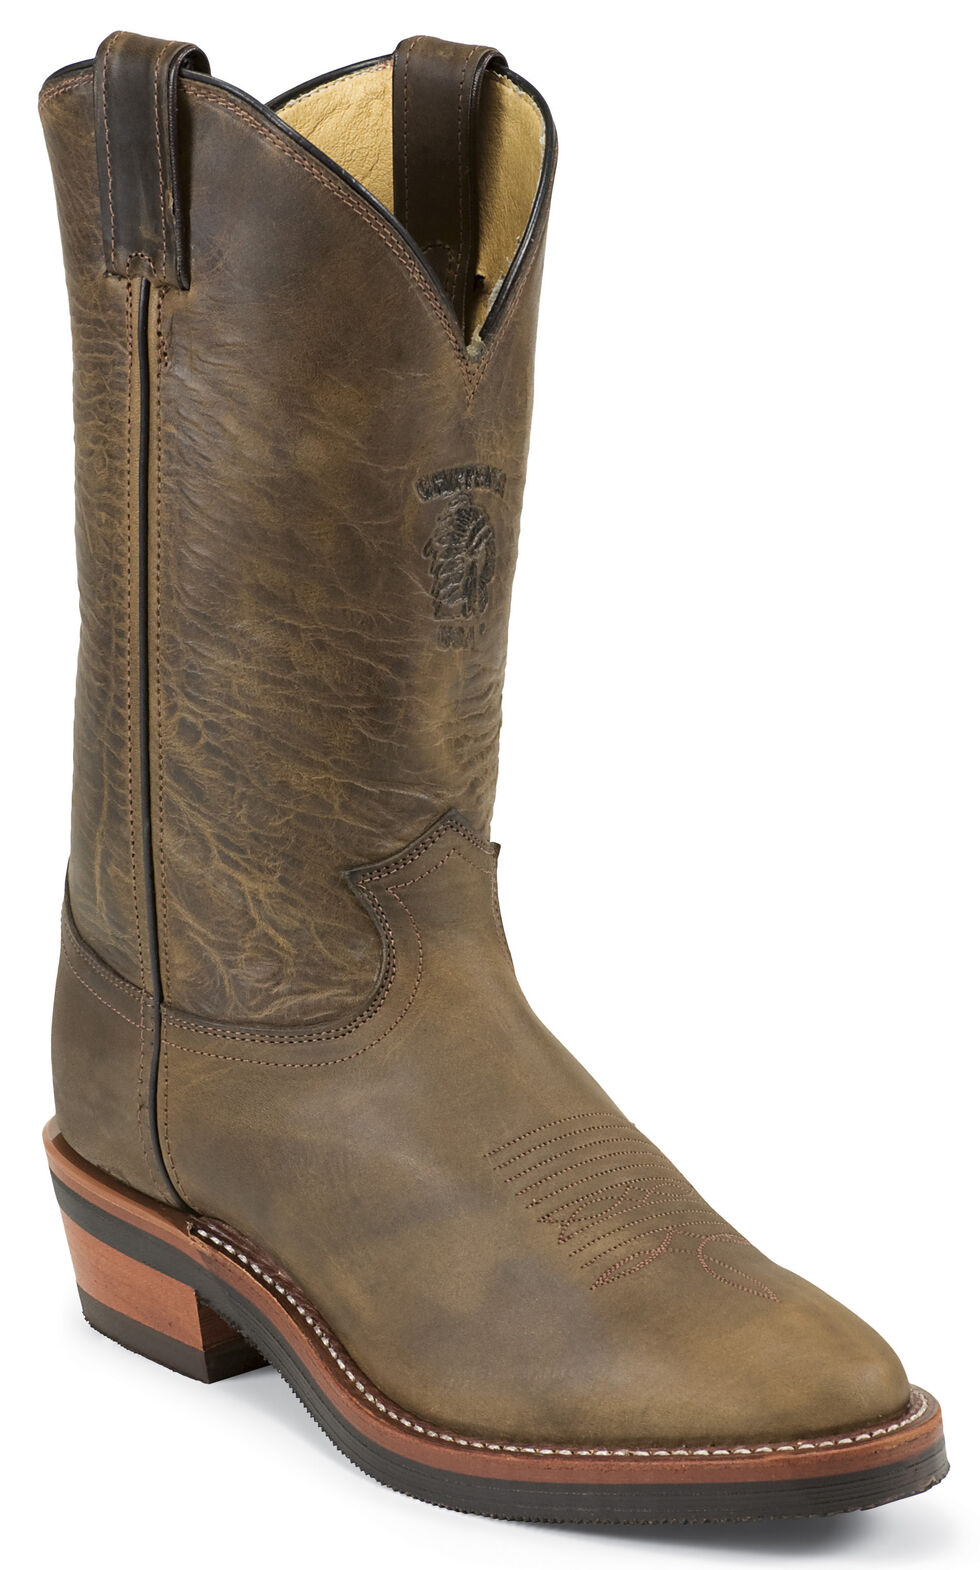 Chippewa Arroyos Bay Apache Packer Boots - Round Toe, Bay Apache, hi-res